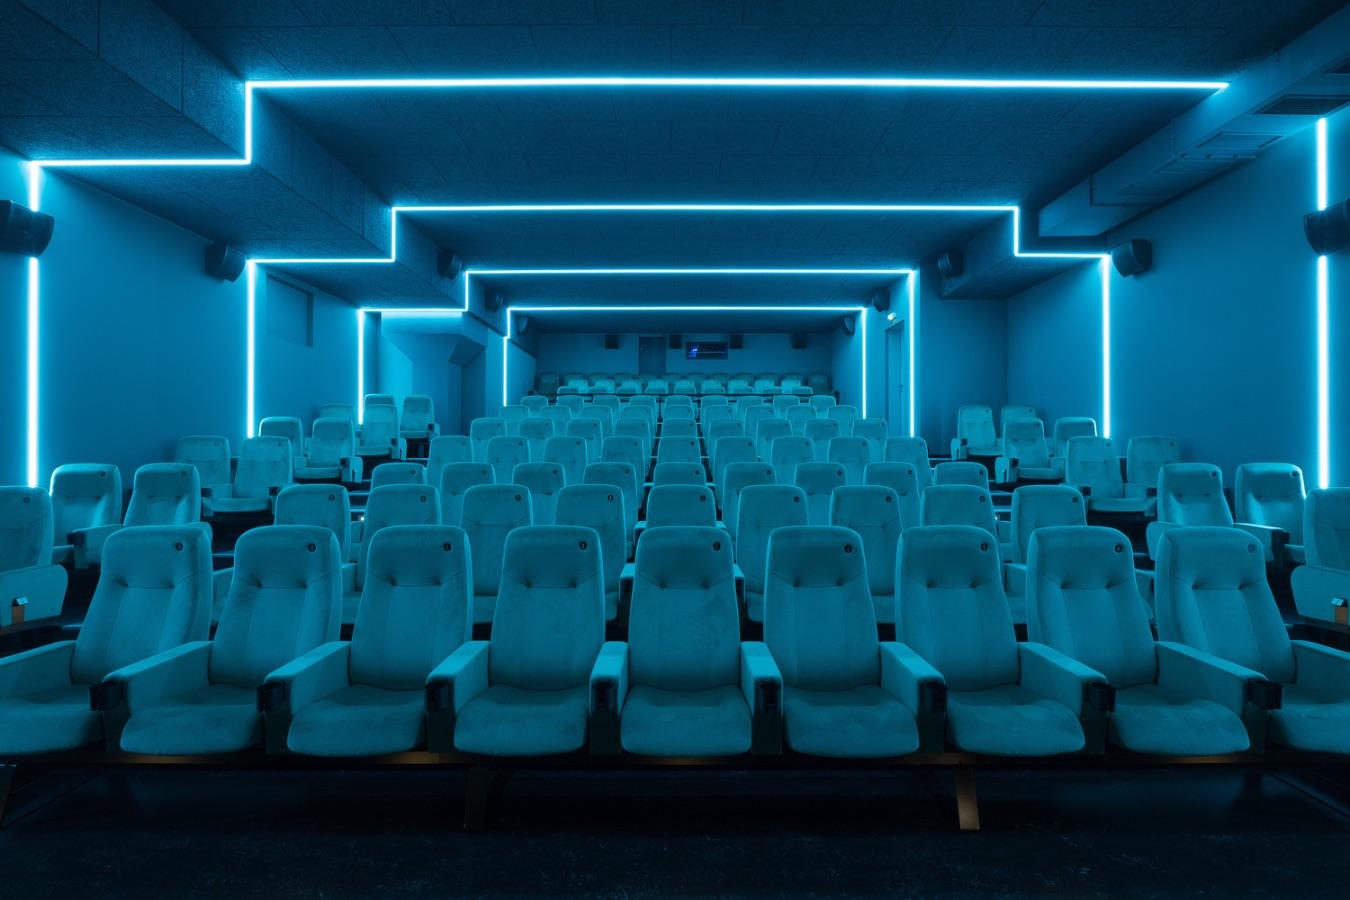 11_Delphi LUX Cinema_Batek Architekten+Ester Bruzkus Architekten_Inspirationist